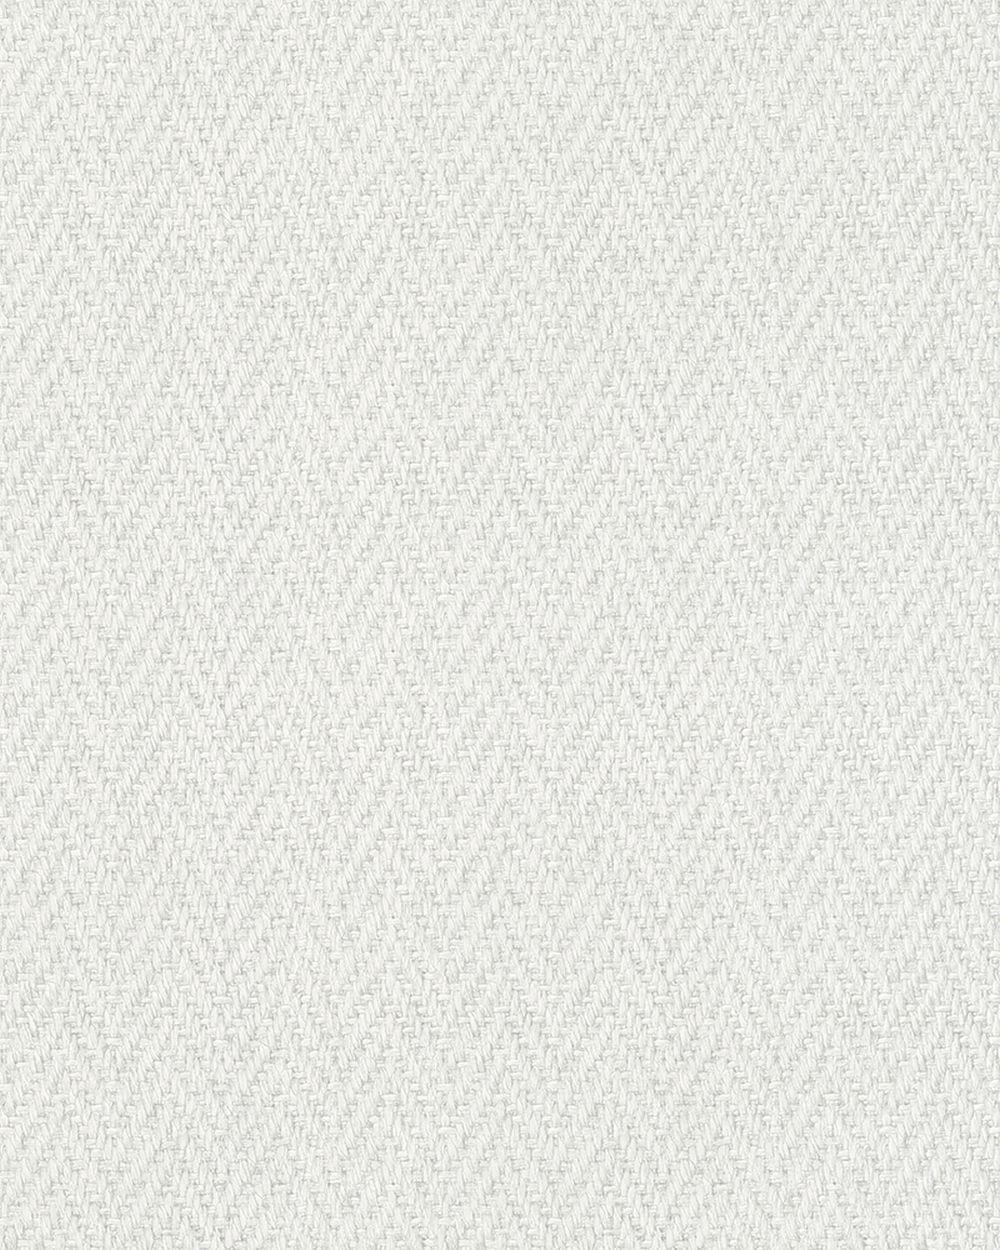 vliestapete rattan flecht optik grau wei marburg 59303. Black Bedroom Furniture Sets. Home Design Ideas